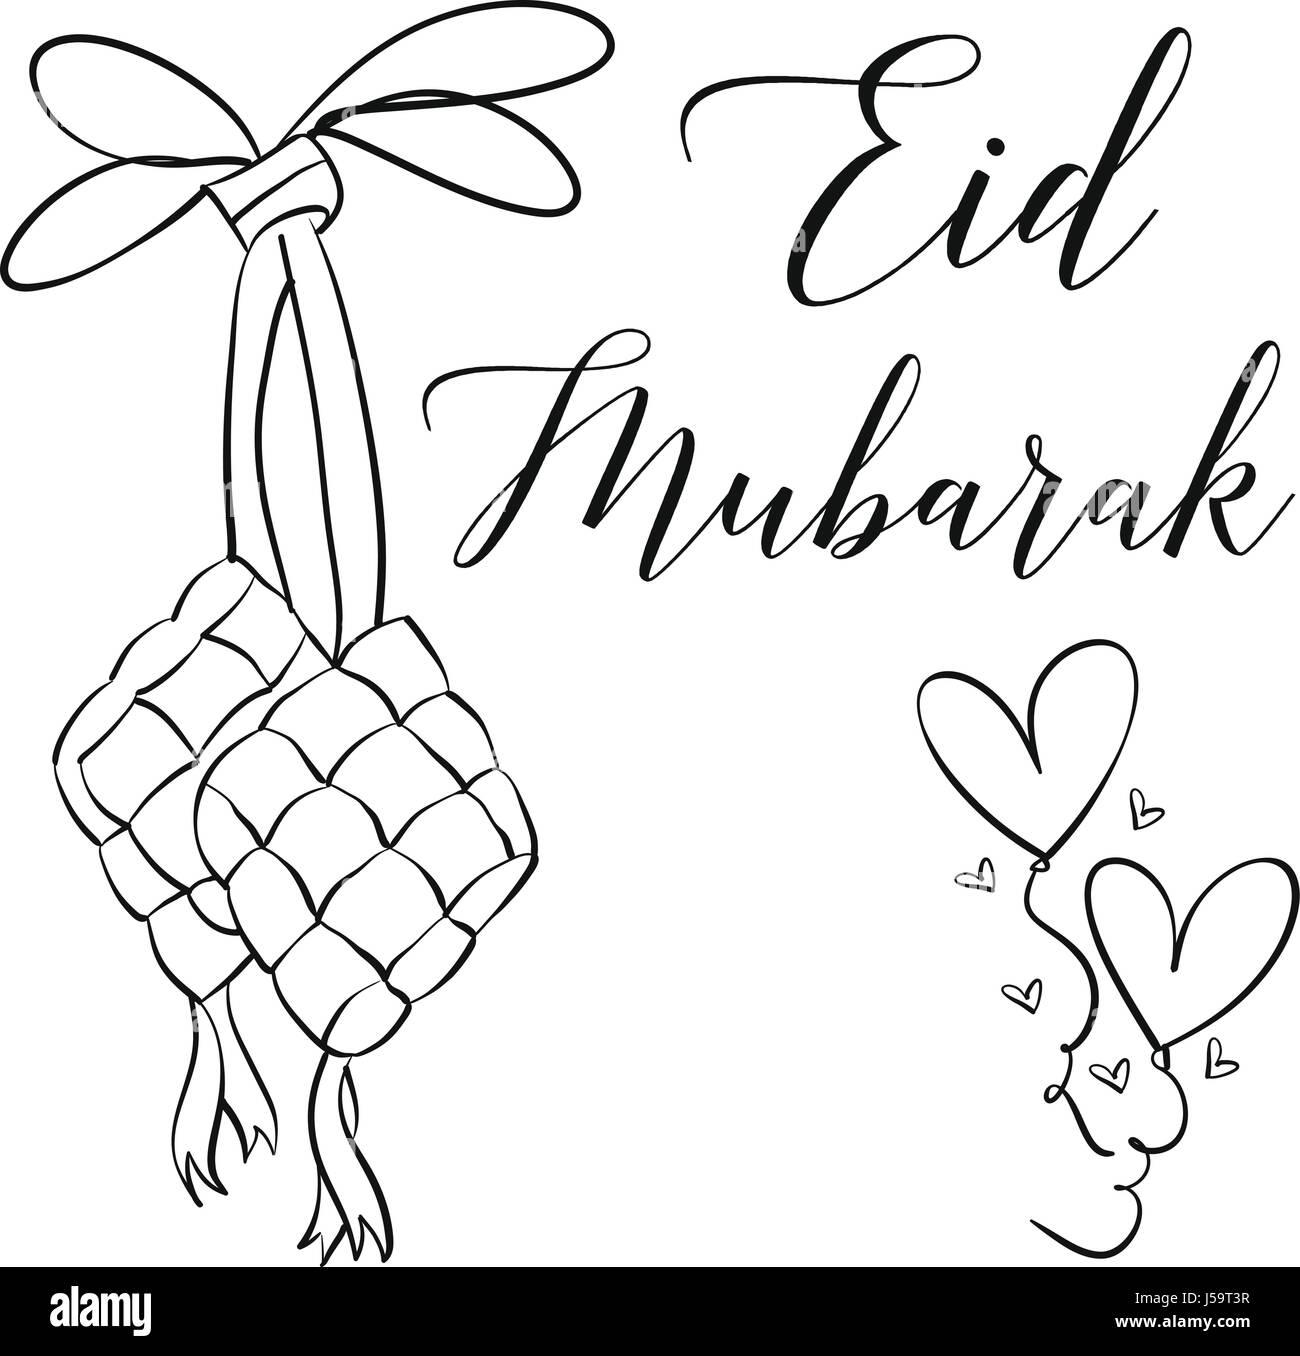 Hand draw greeting card eid mubarak stock vector art illustration hand draw greeting card eid mubarak m4hsunfo Images